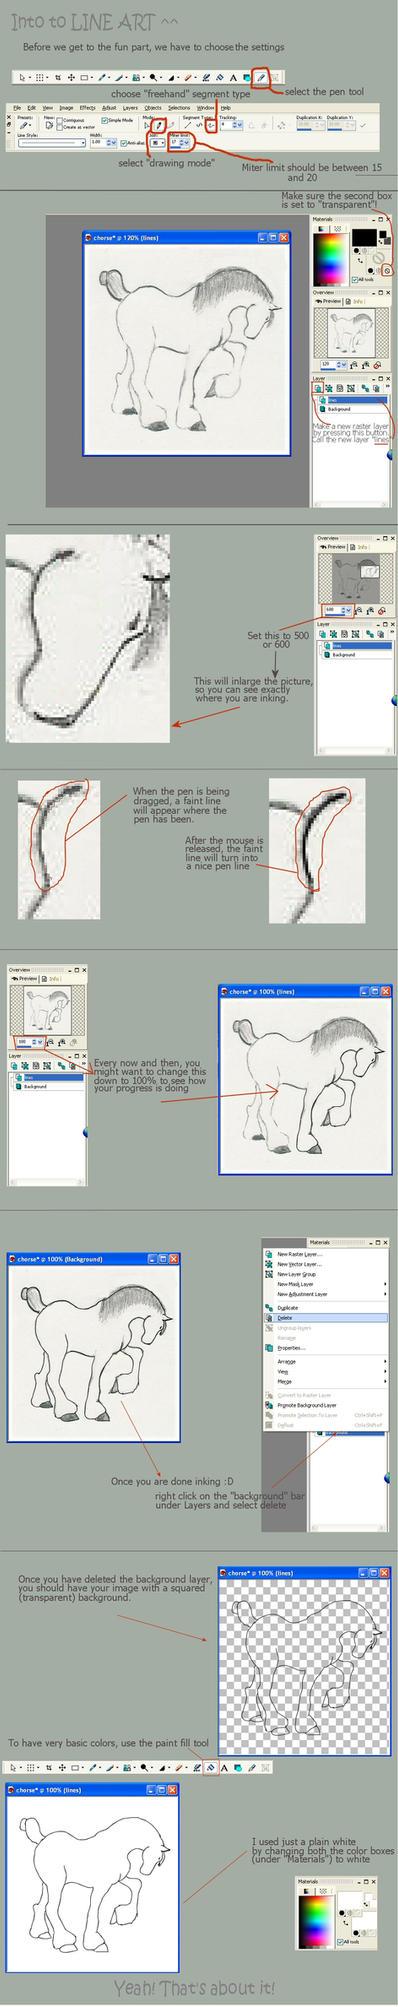 Basic line art tutorial by kliptopyro